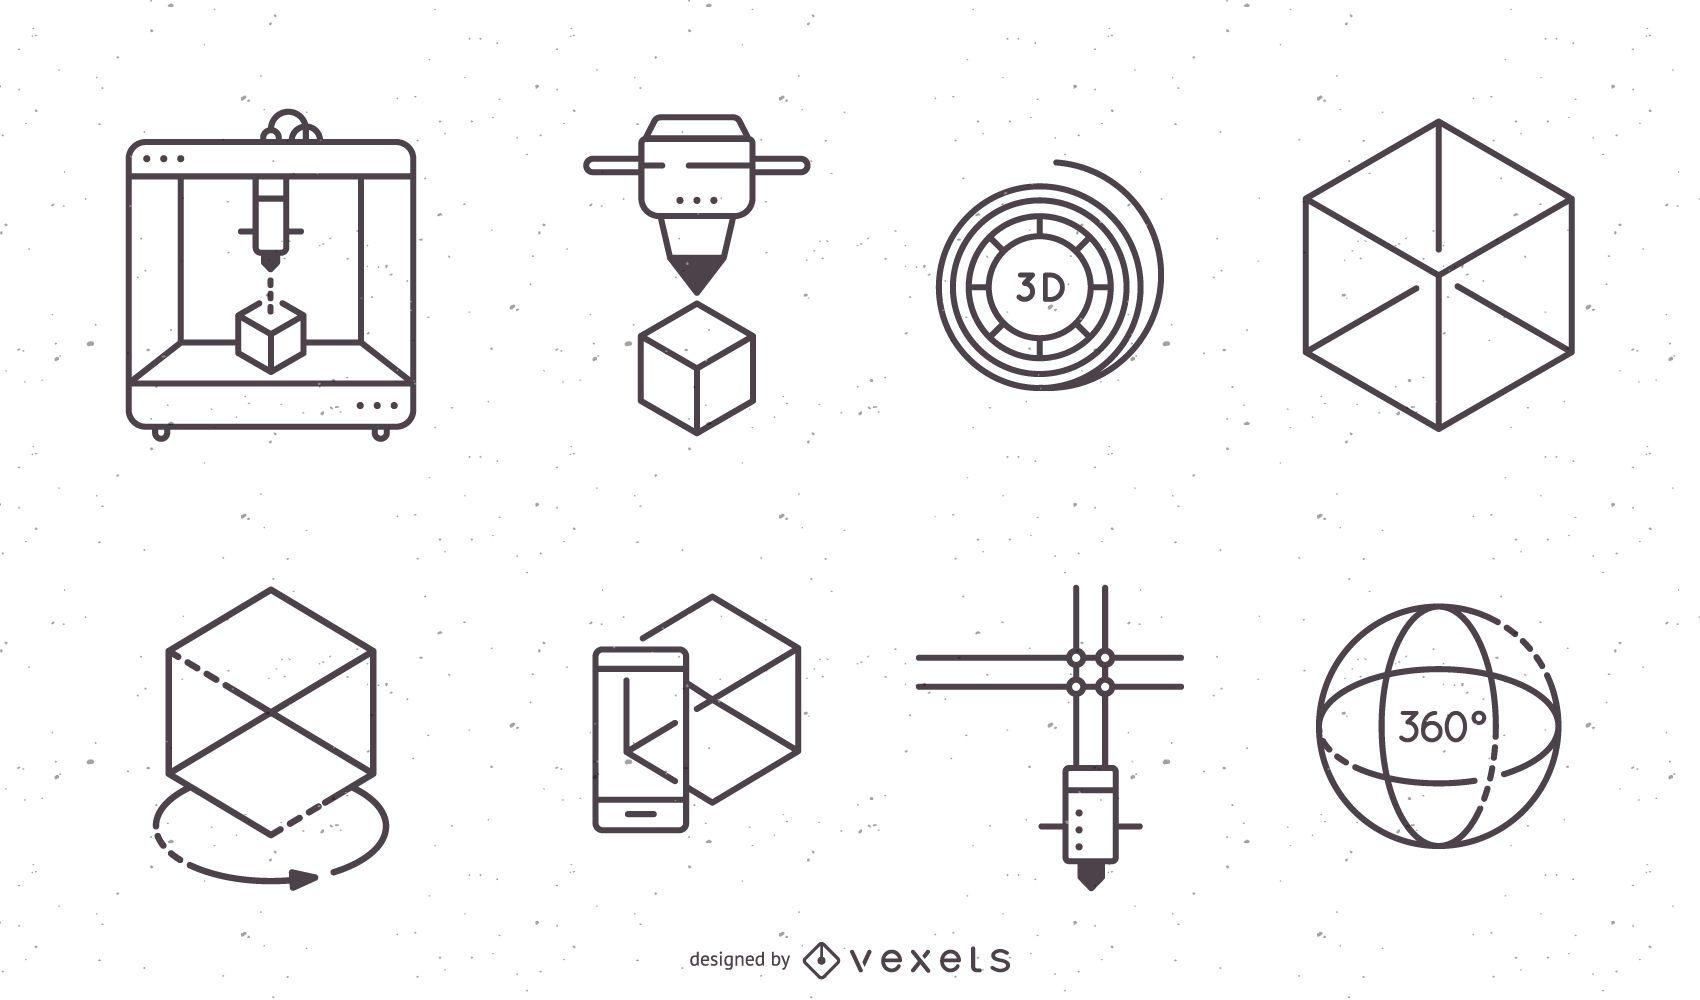 Conjunto de iconos de impresi?n 3D